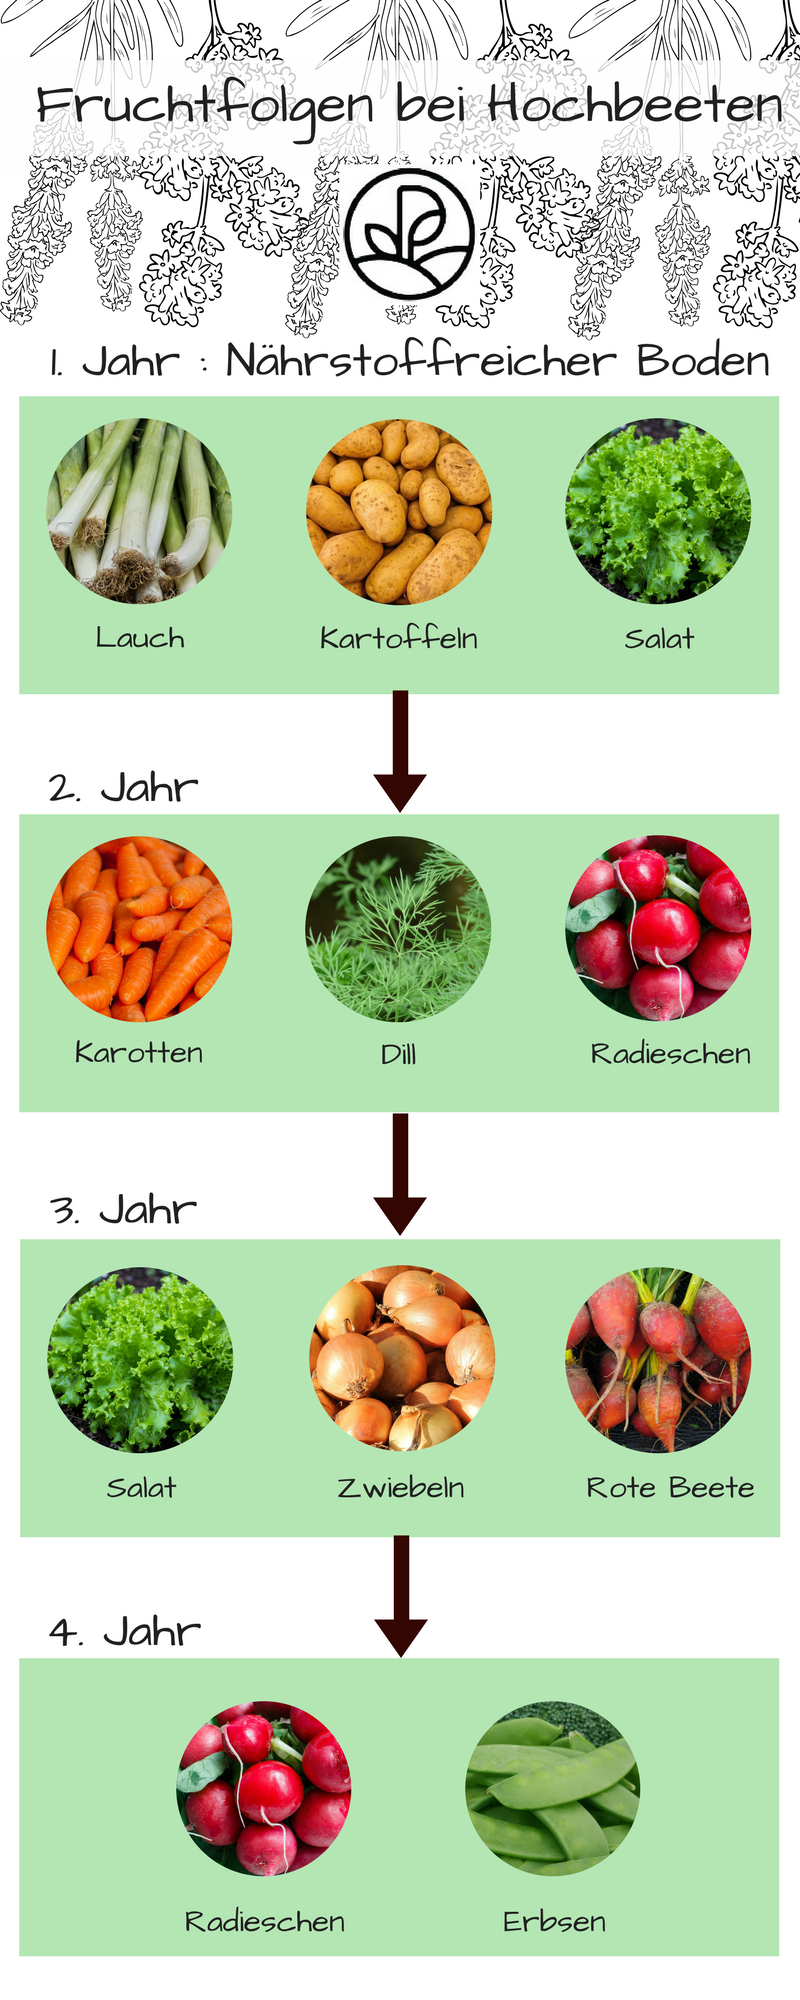 Hochbeet bepflanzen: Pflanzplan, Mischkultur & Gründüngung #erhöhtepflanzbeete